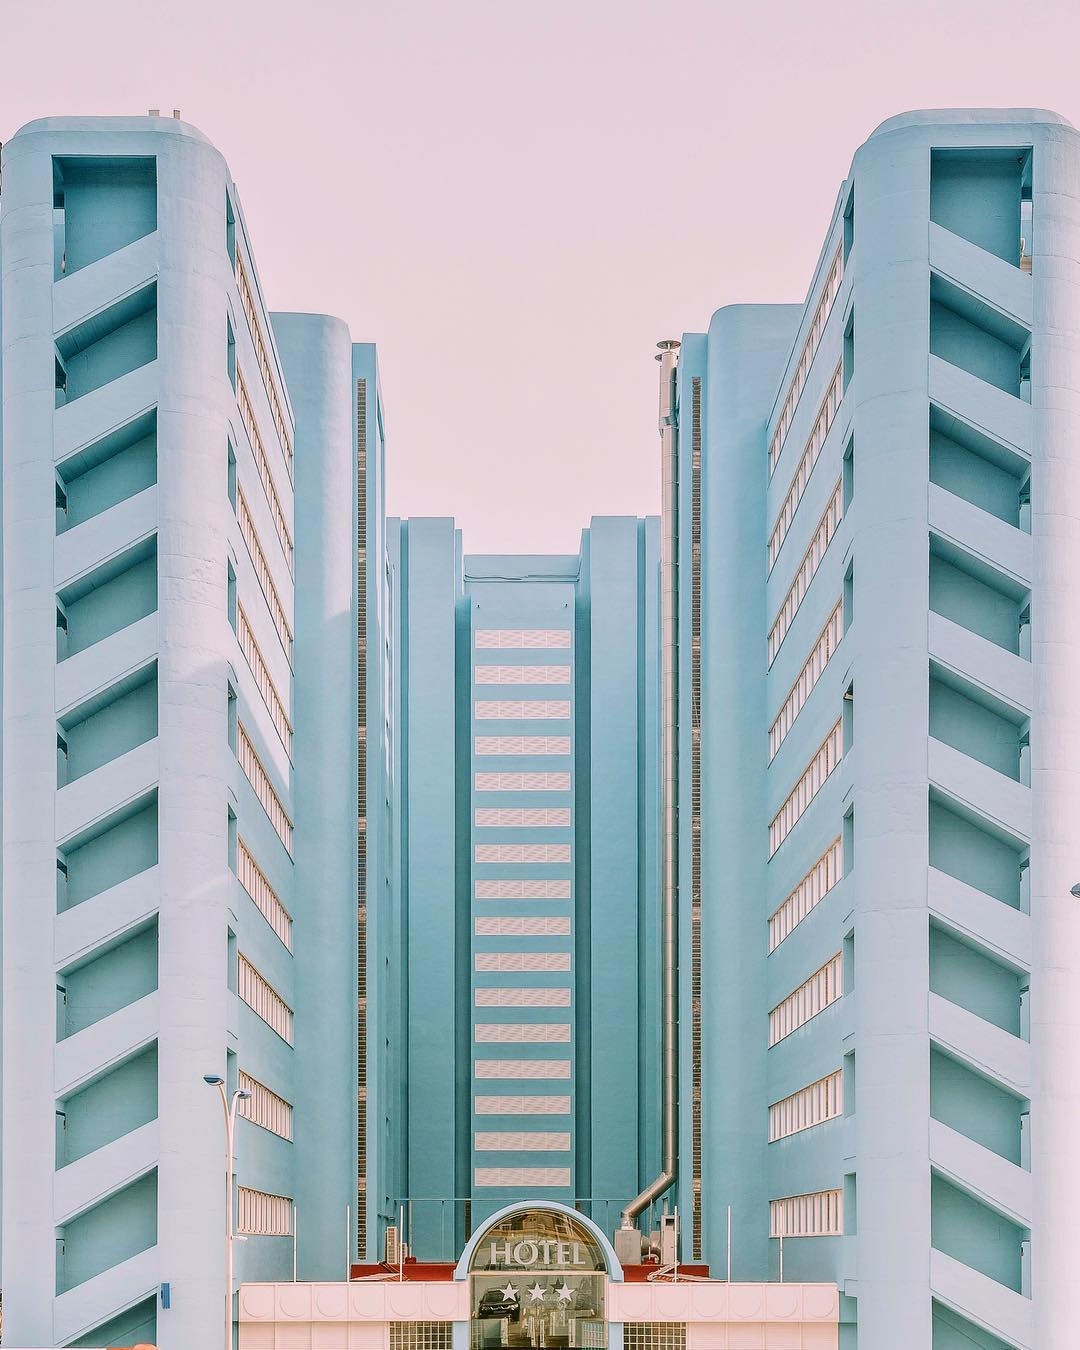 fotografo Joaquin Lucas paleta de colores de Wes Anderson  (11)